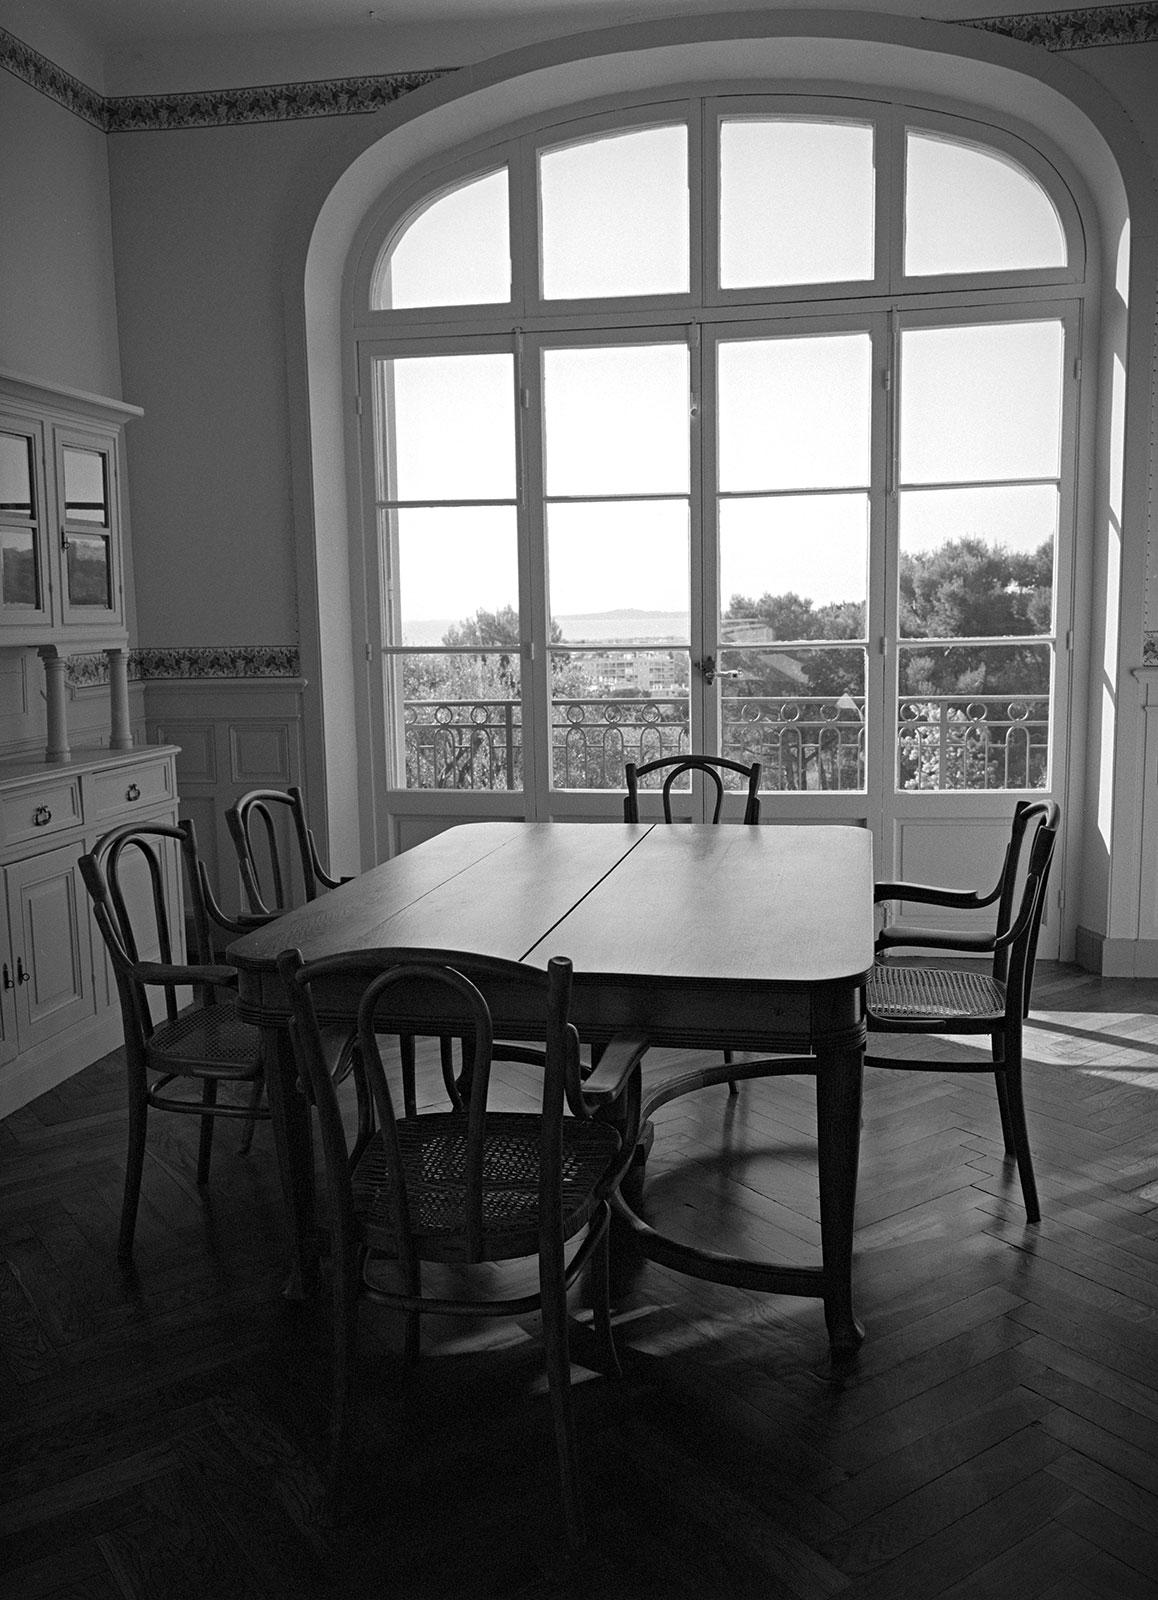 Maestro's dining room